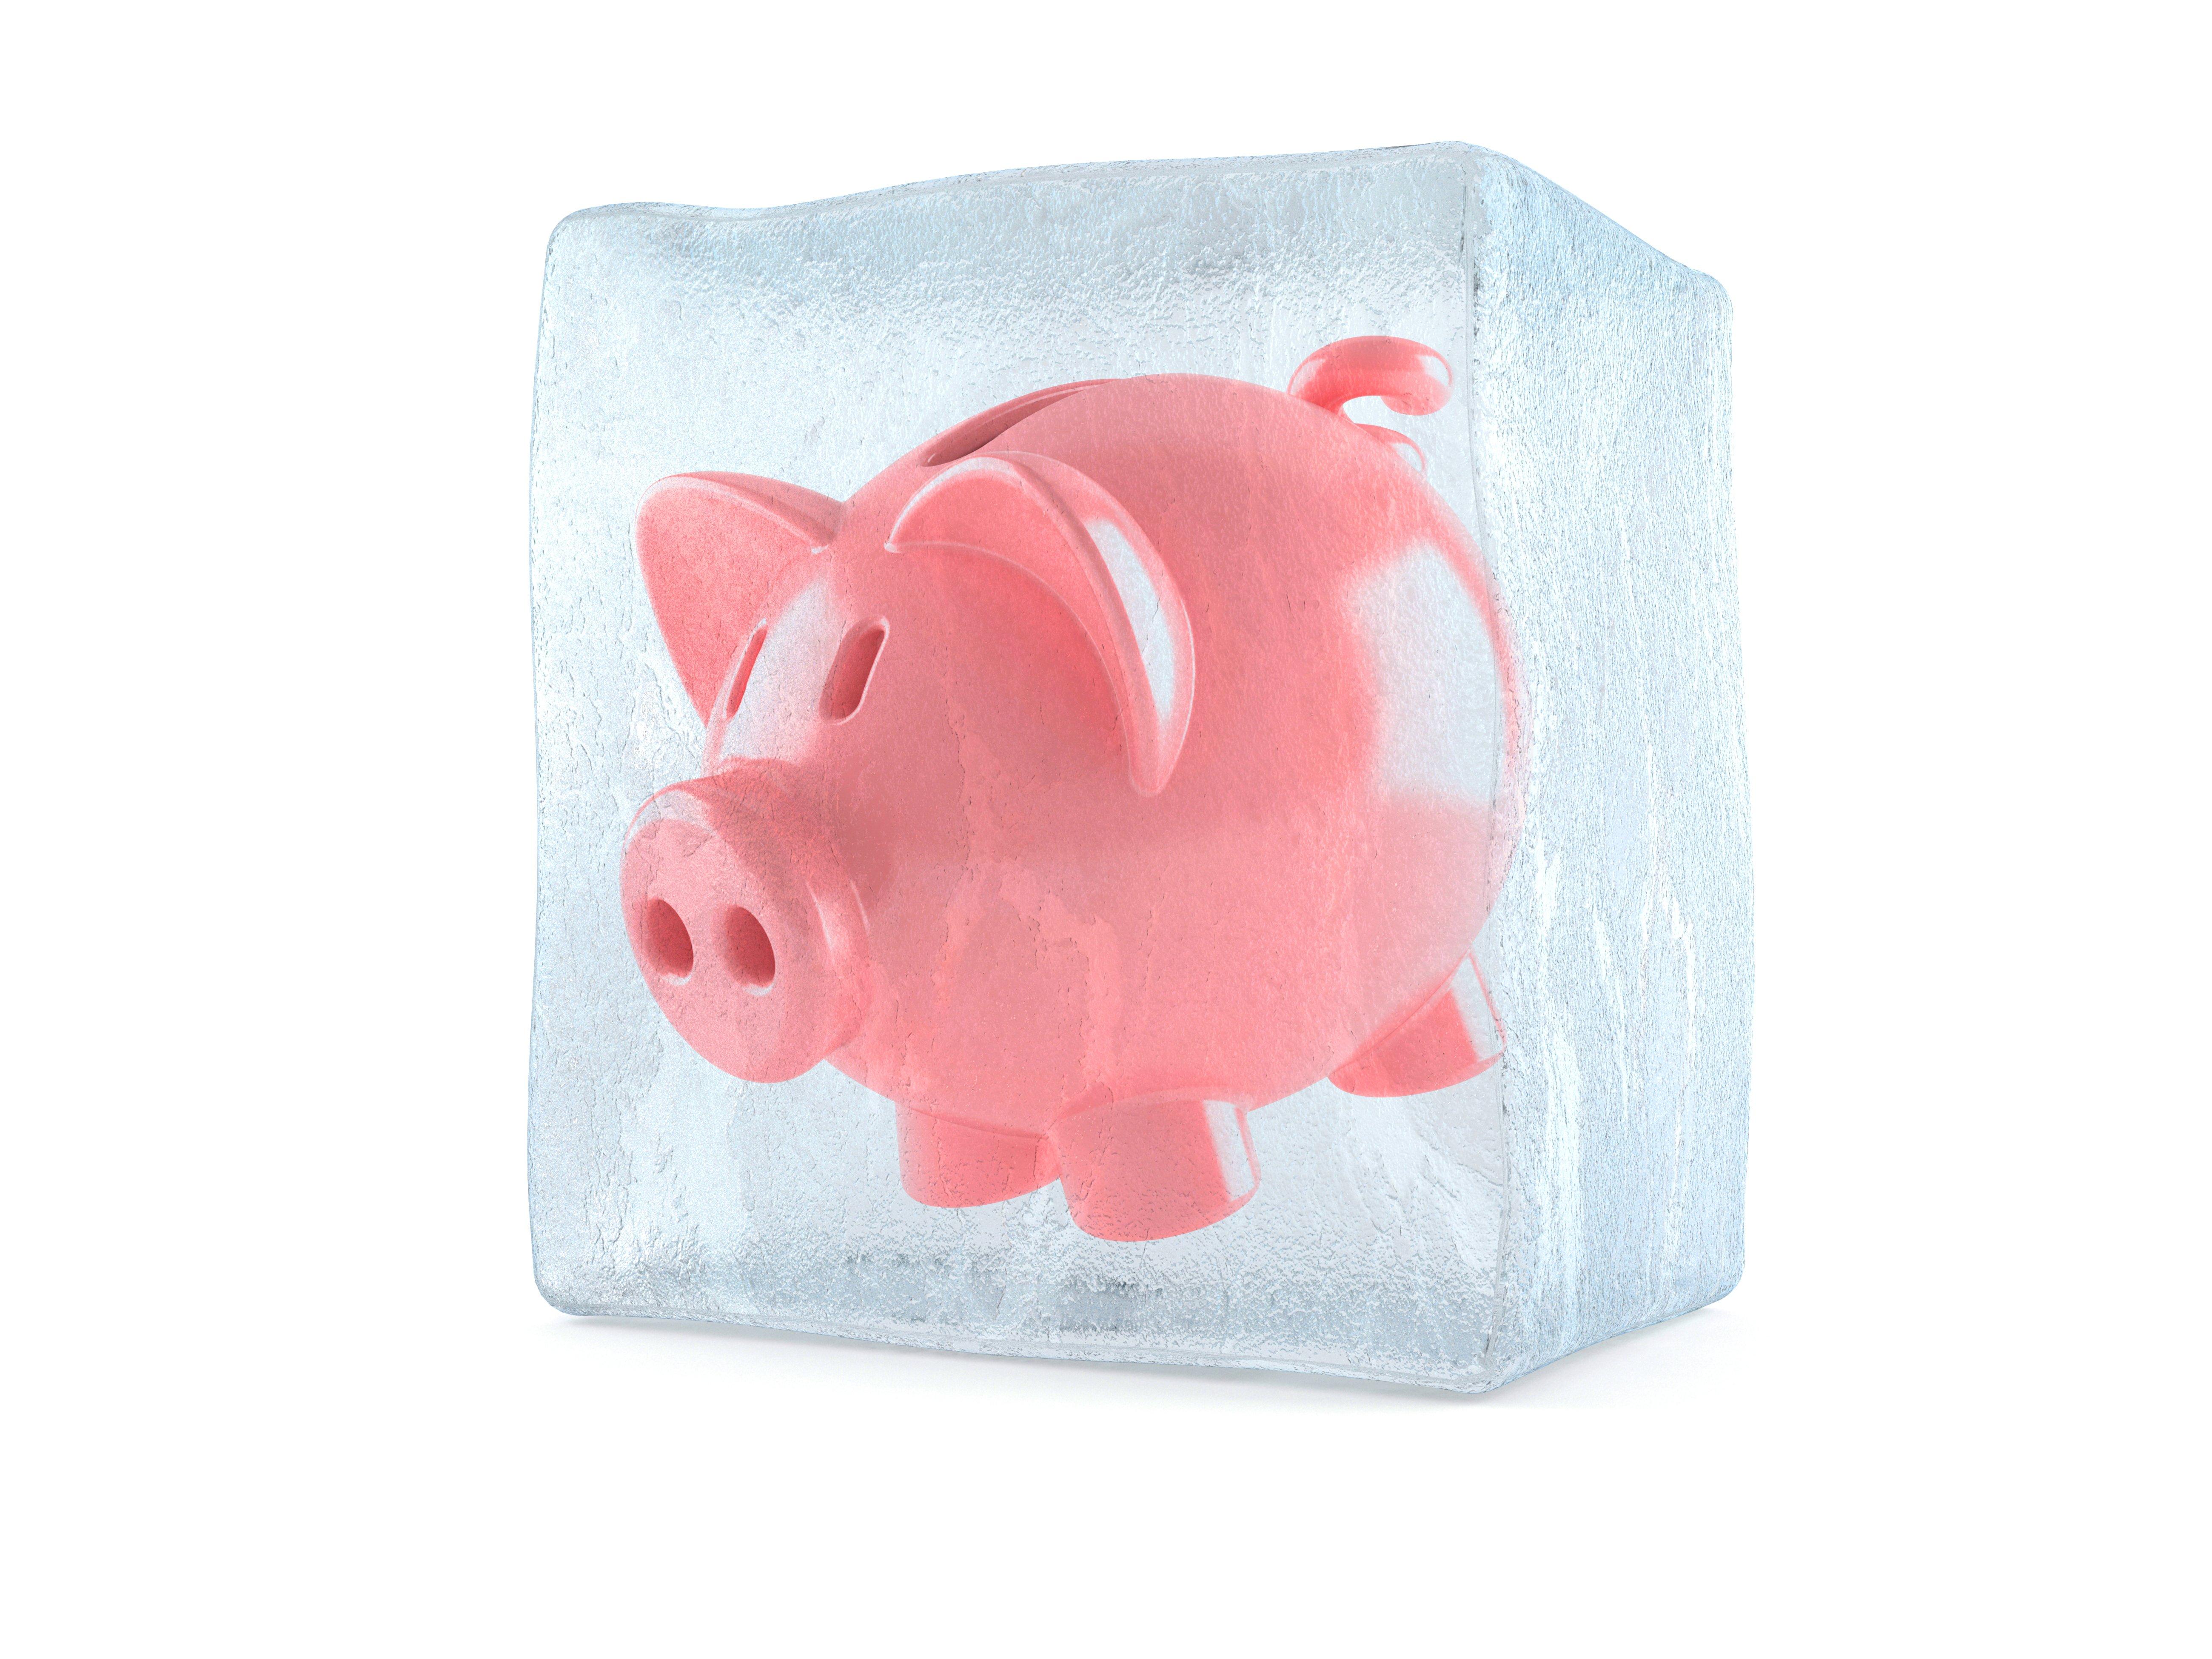 Piggy bank inside ice cube